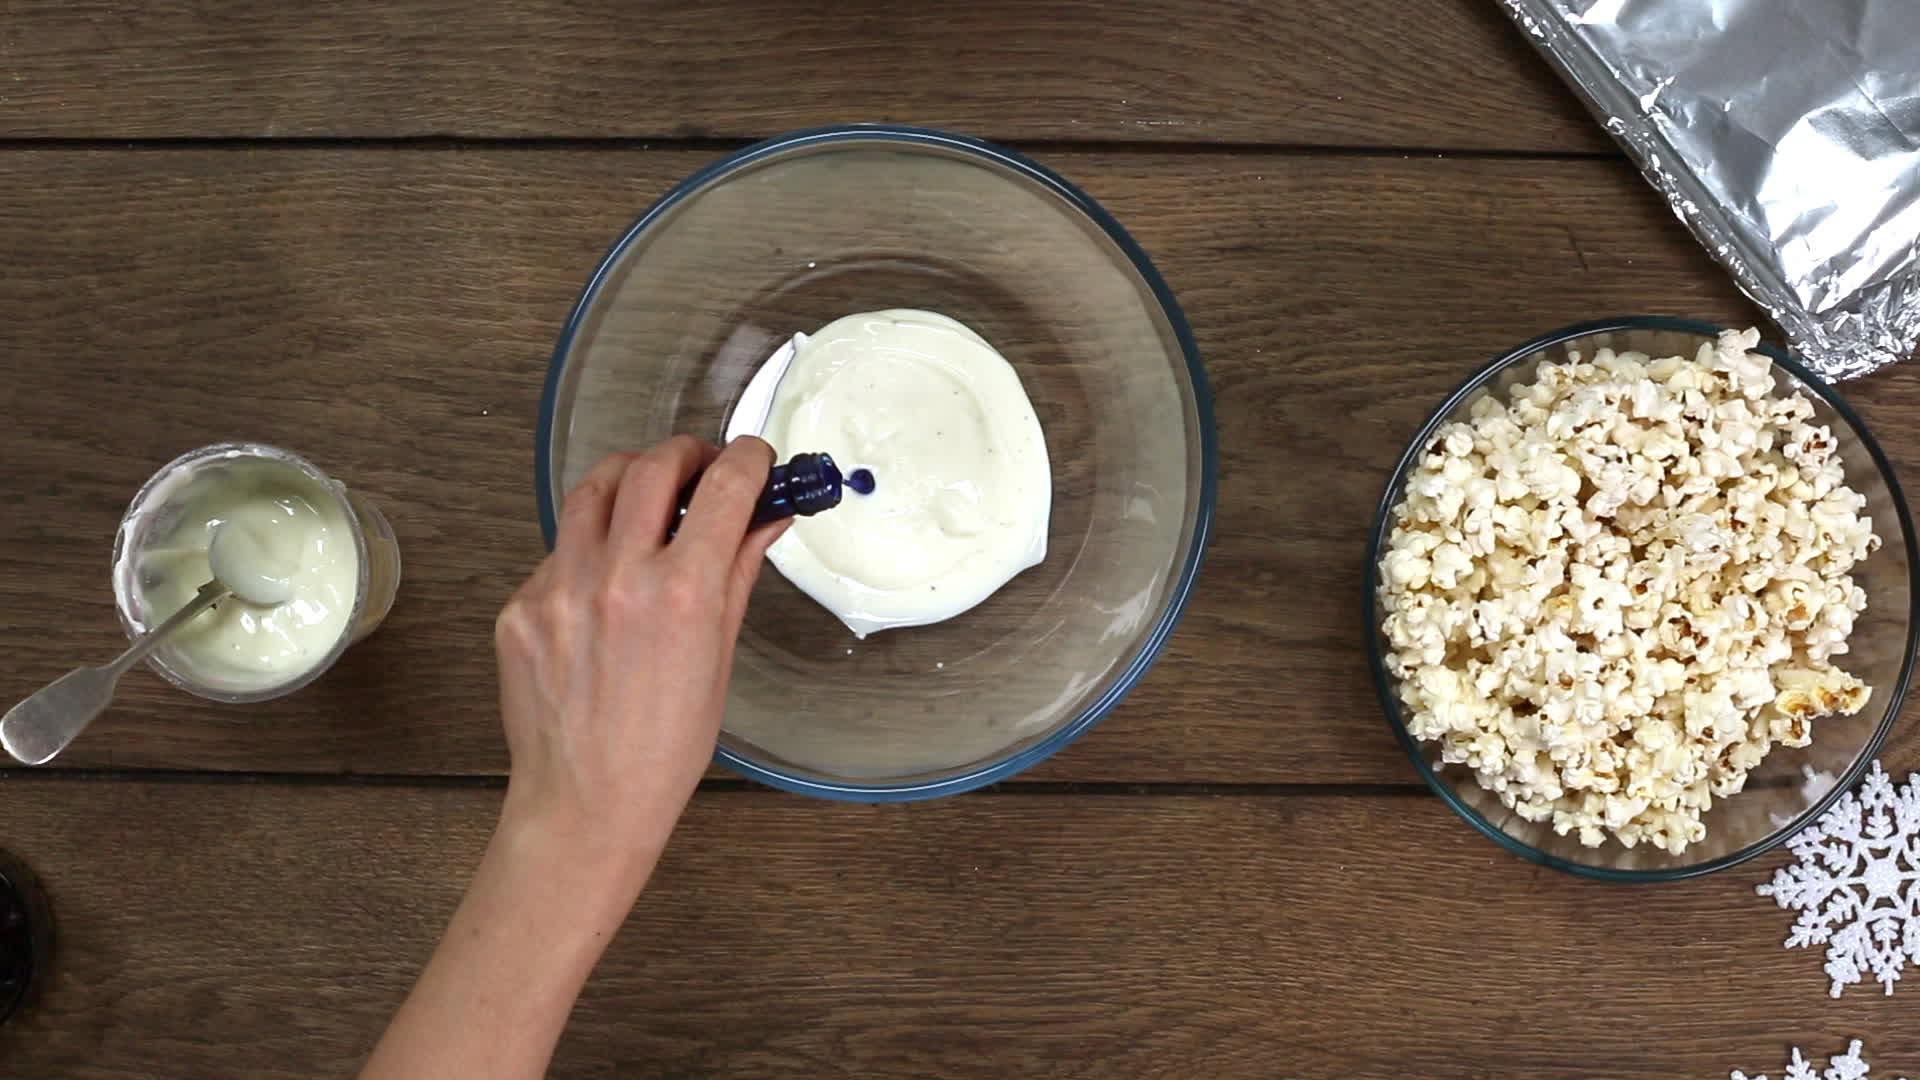 Frozen: Magic of the Northern Lights Popcorn